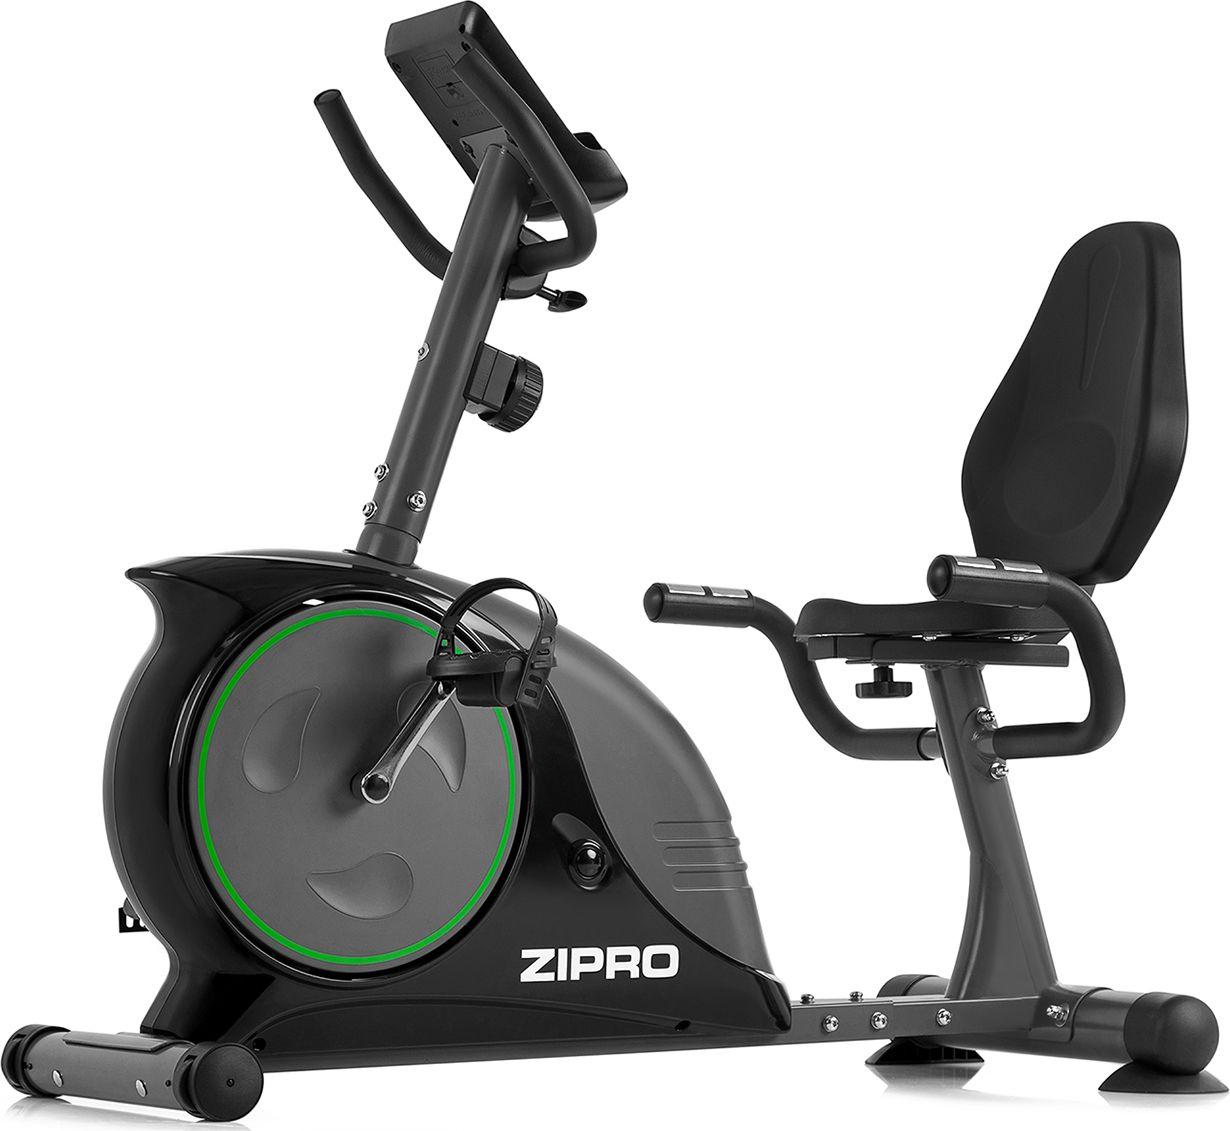 Komputer rower treningowy poziomy Easy Zipro